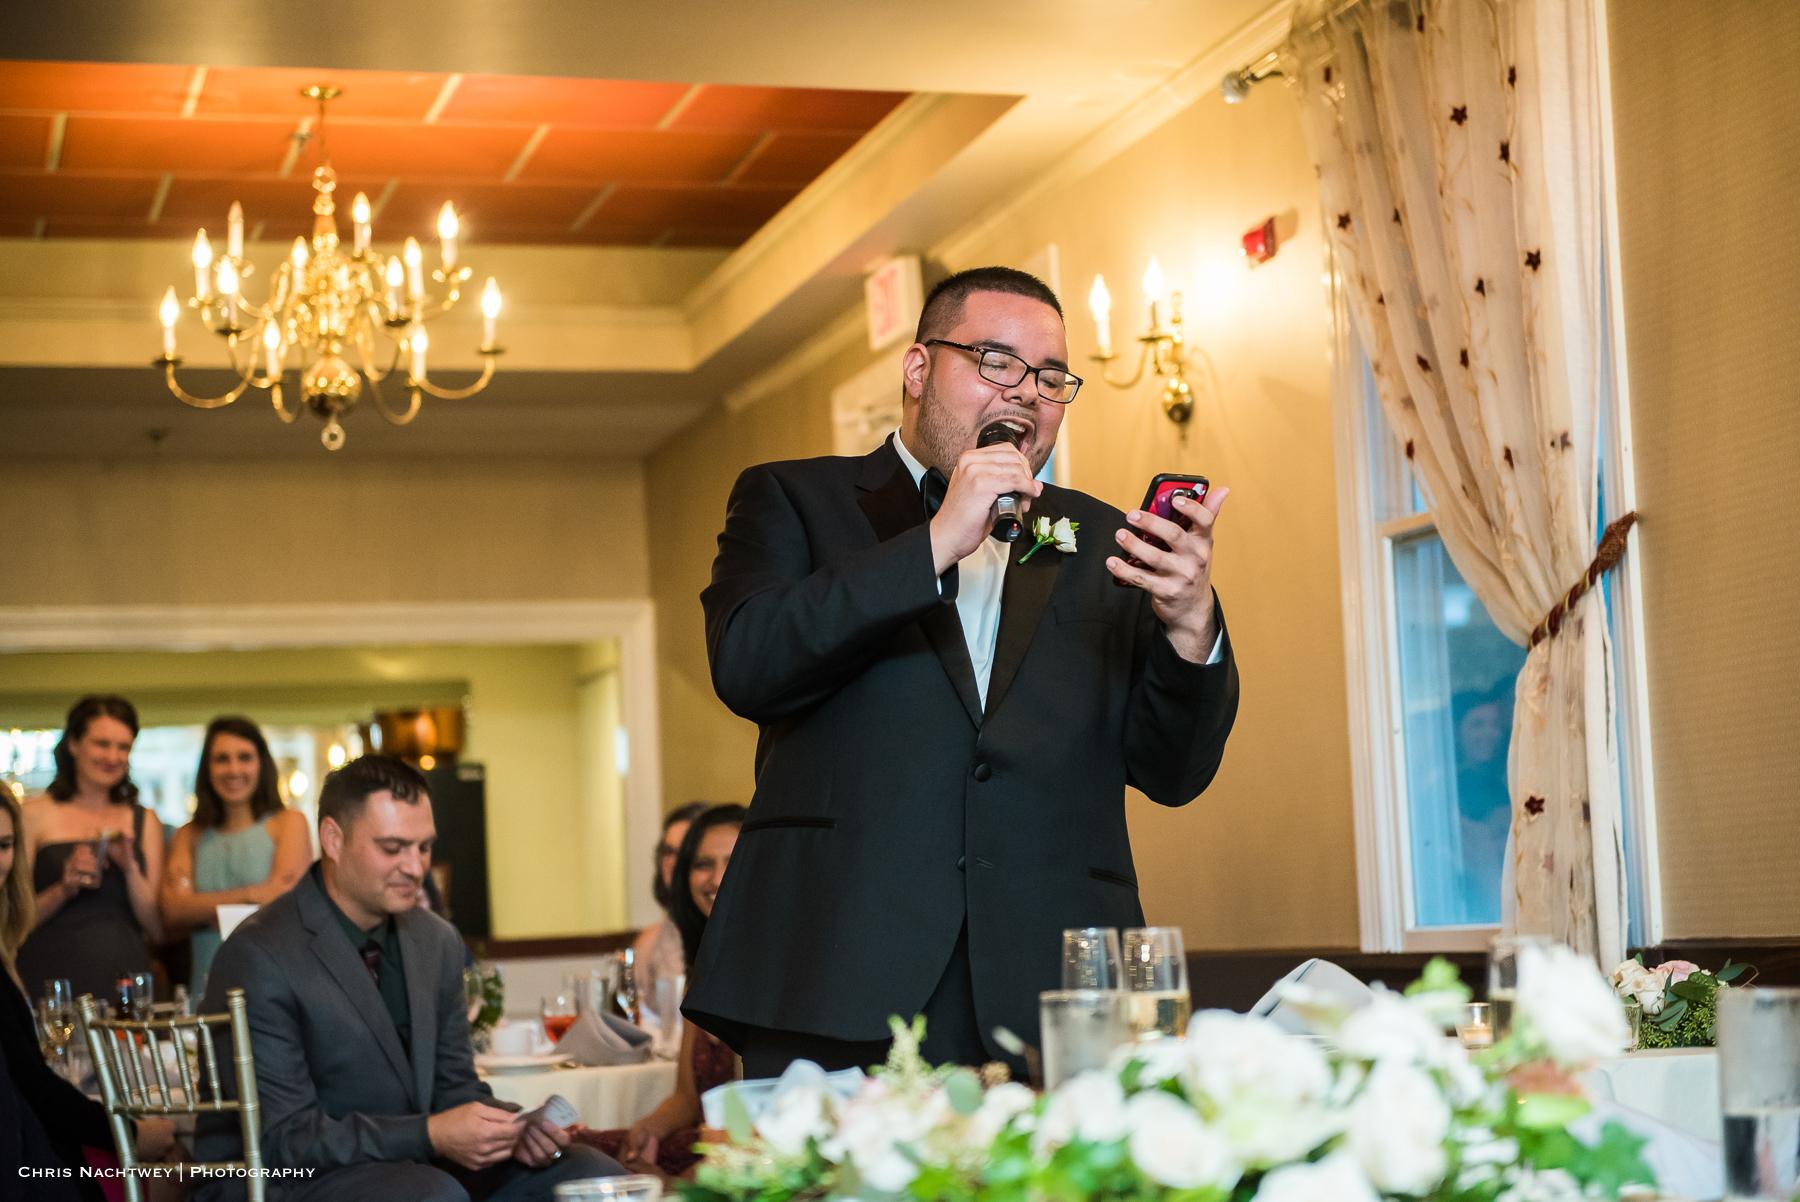 wedding-the-litchfield-inn-ct-photos-chris-nachtwey-photography-2018-53.jpg